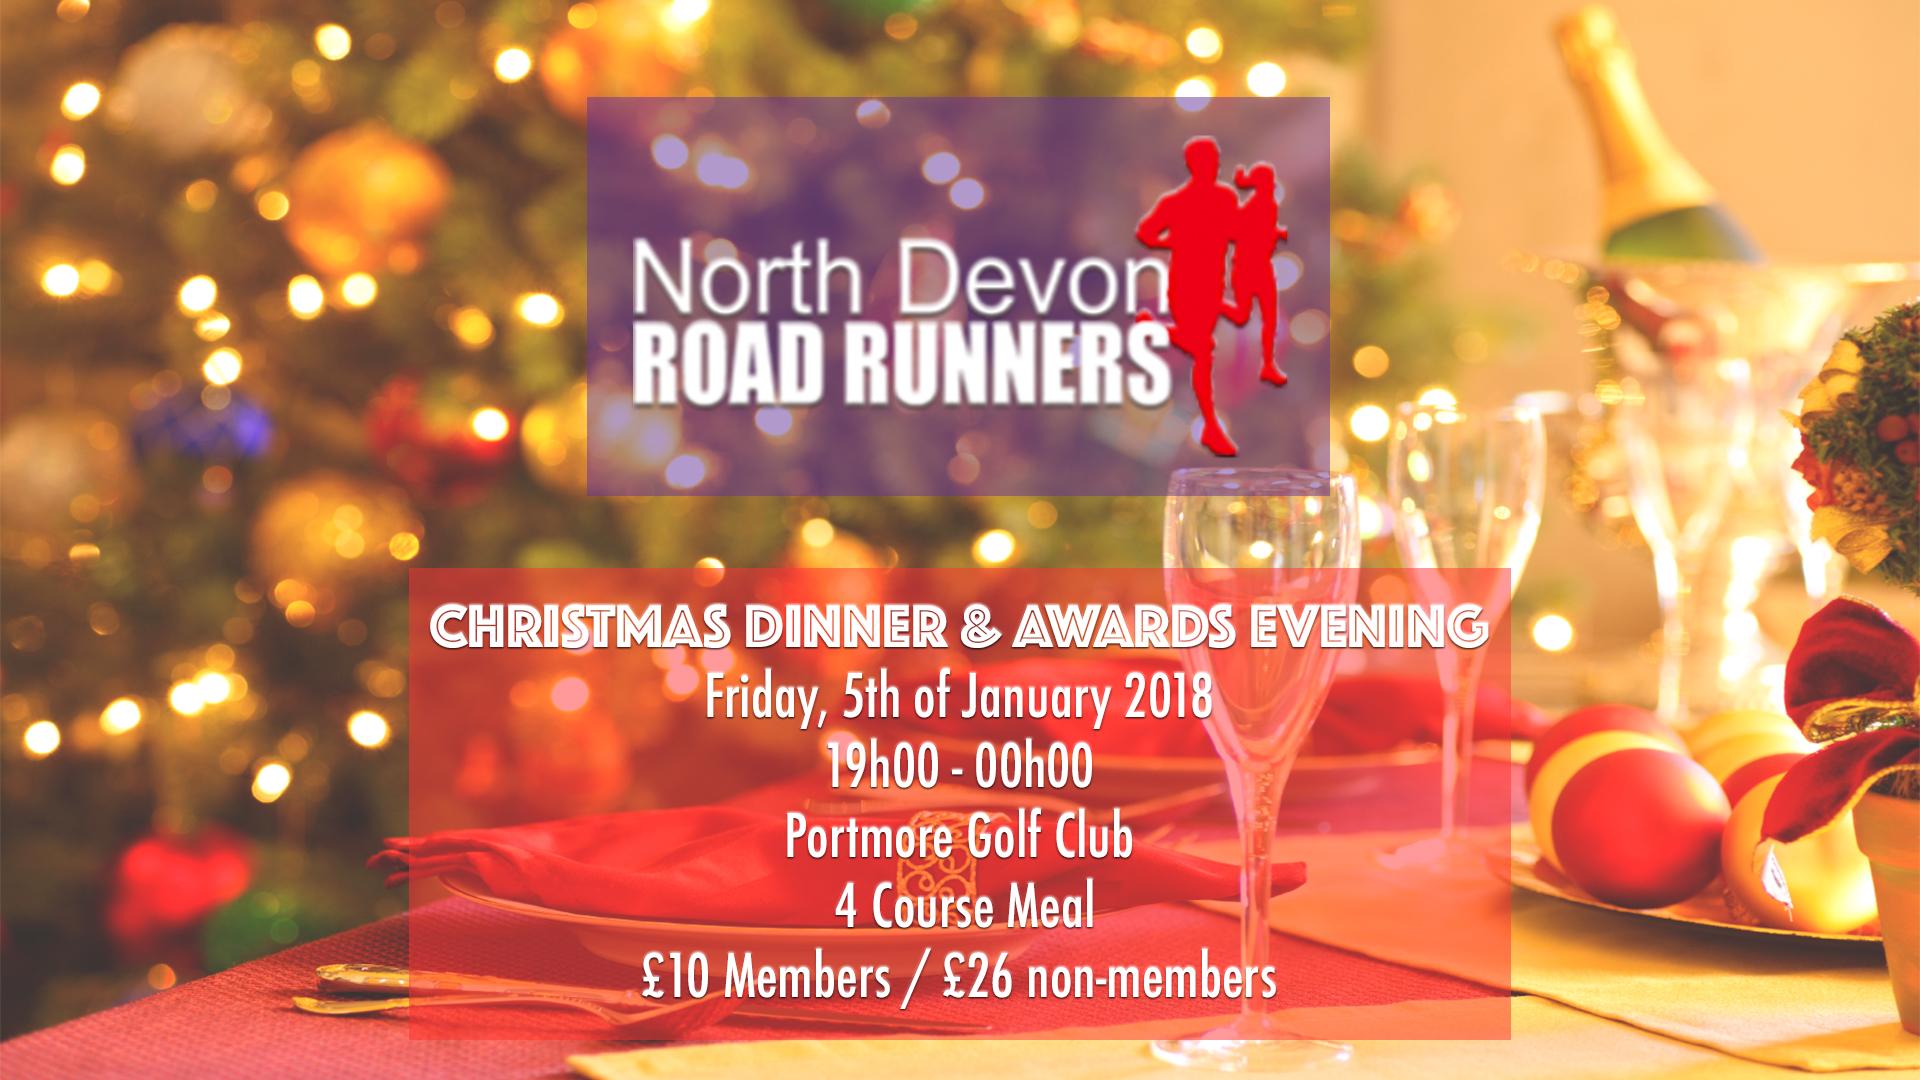 Christmas Evening Party.North Devon Road Runners Christmas Party Awards Evening